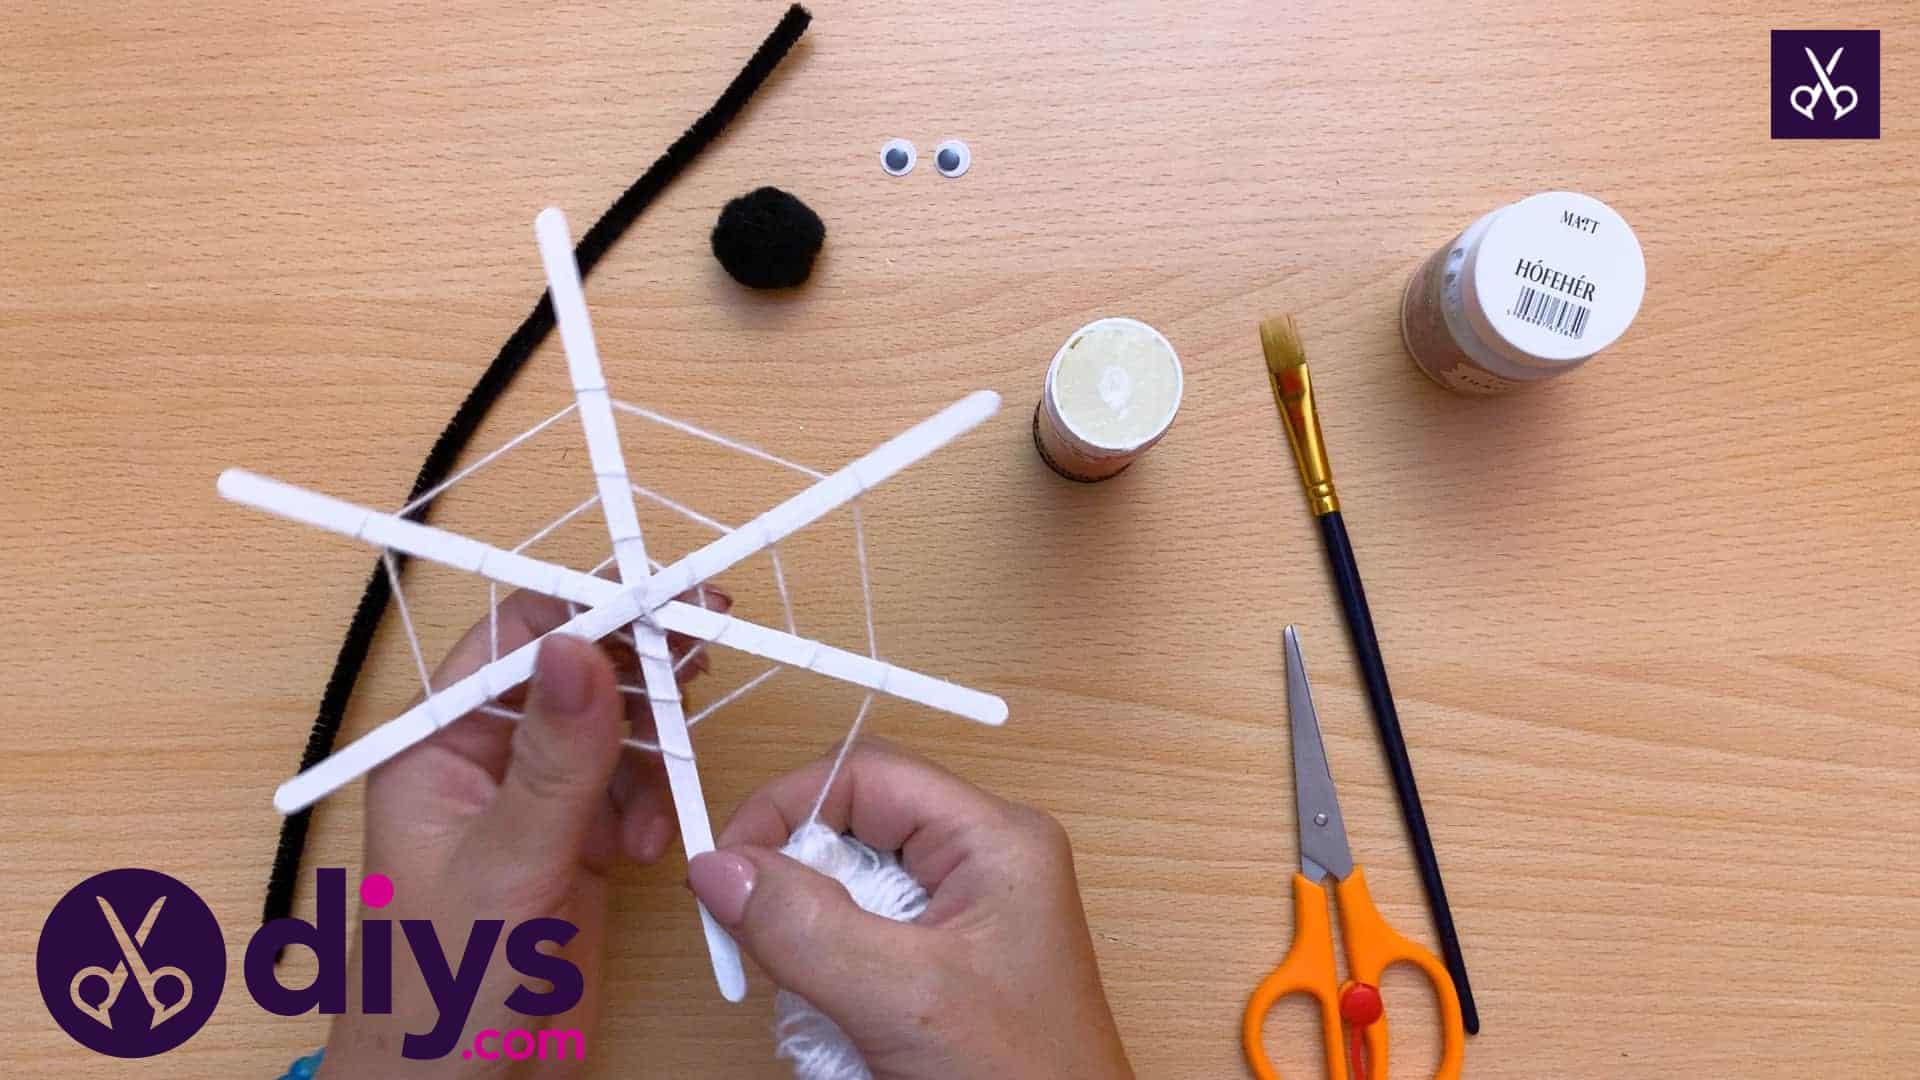 Diy spider web decoration for halloween form